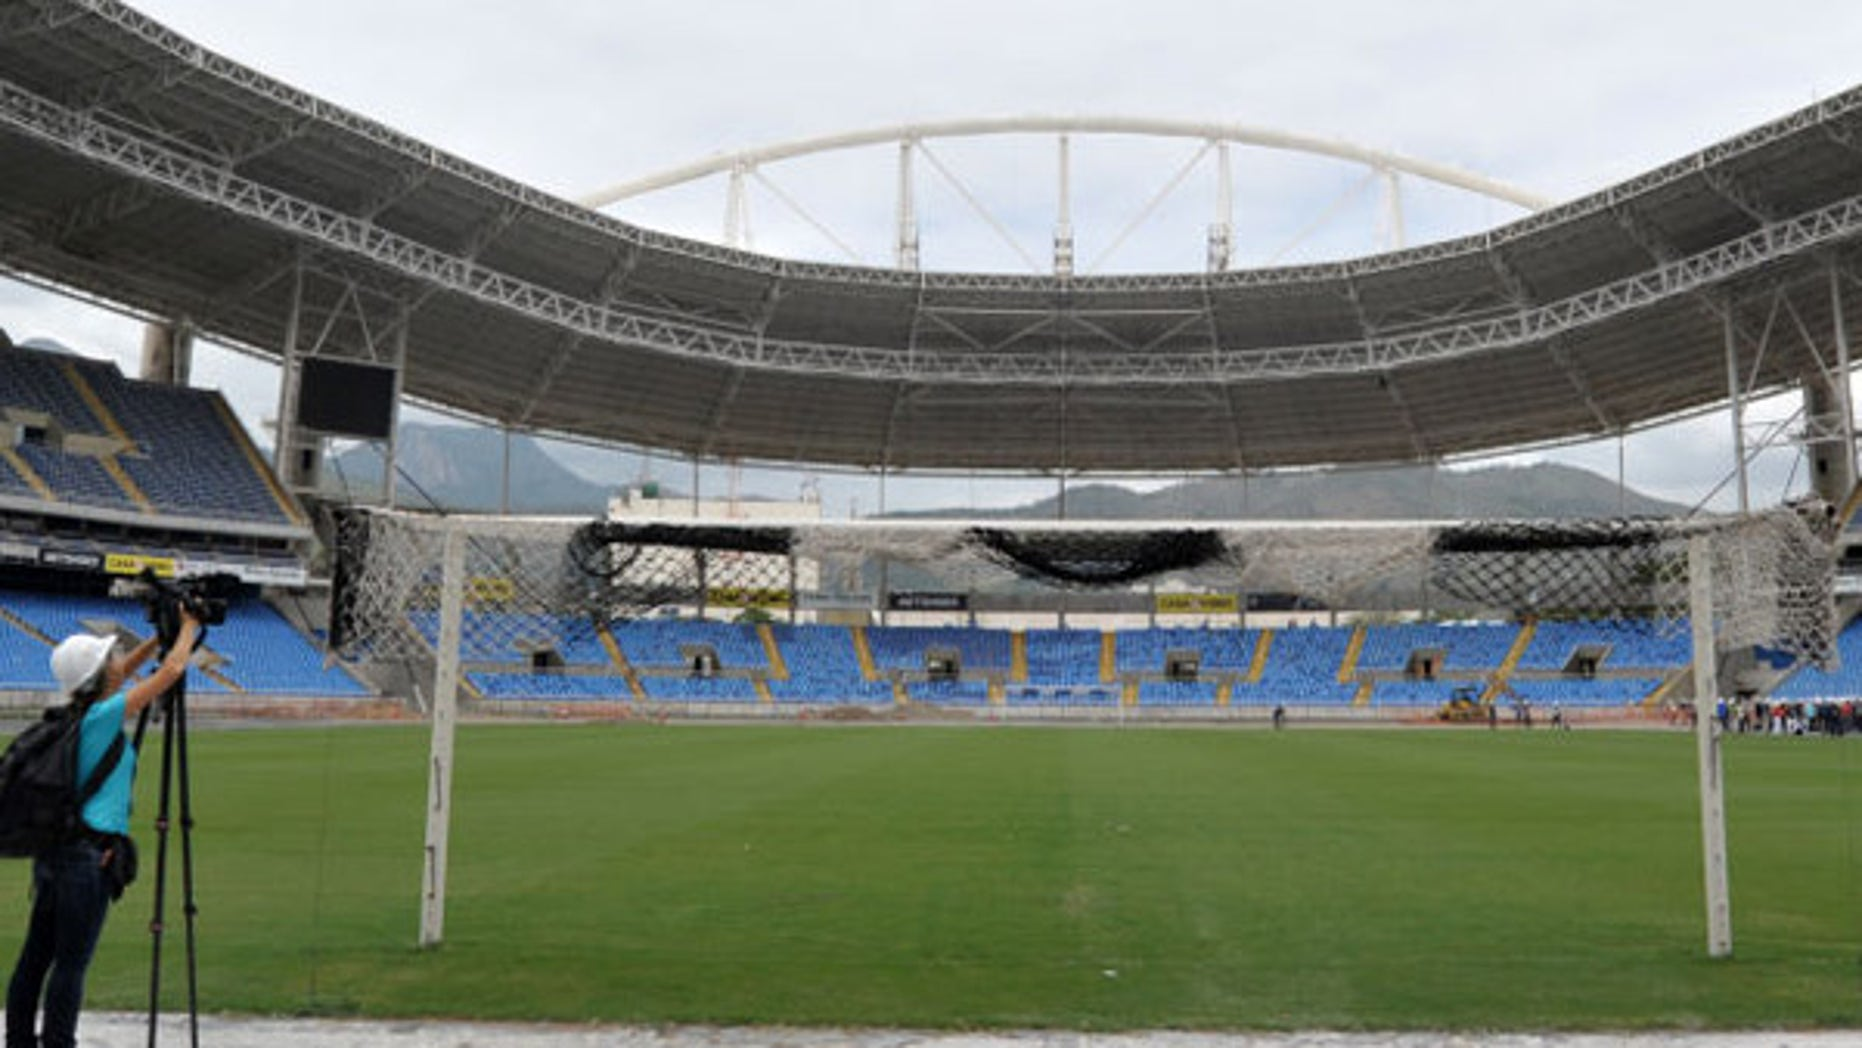 Rio's track and field stadium.